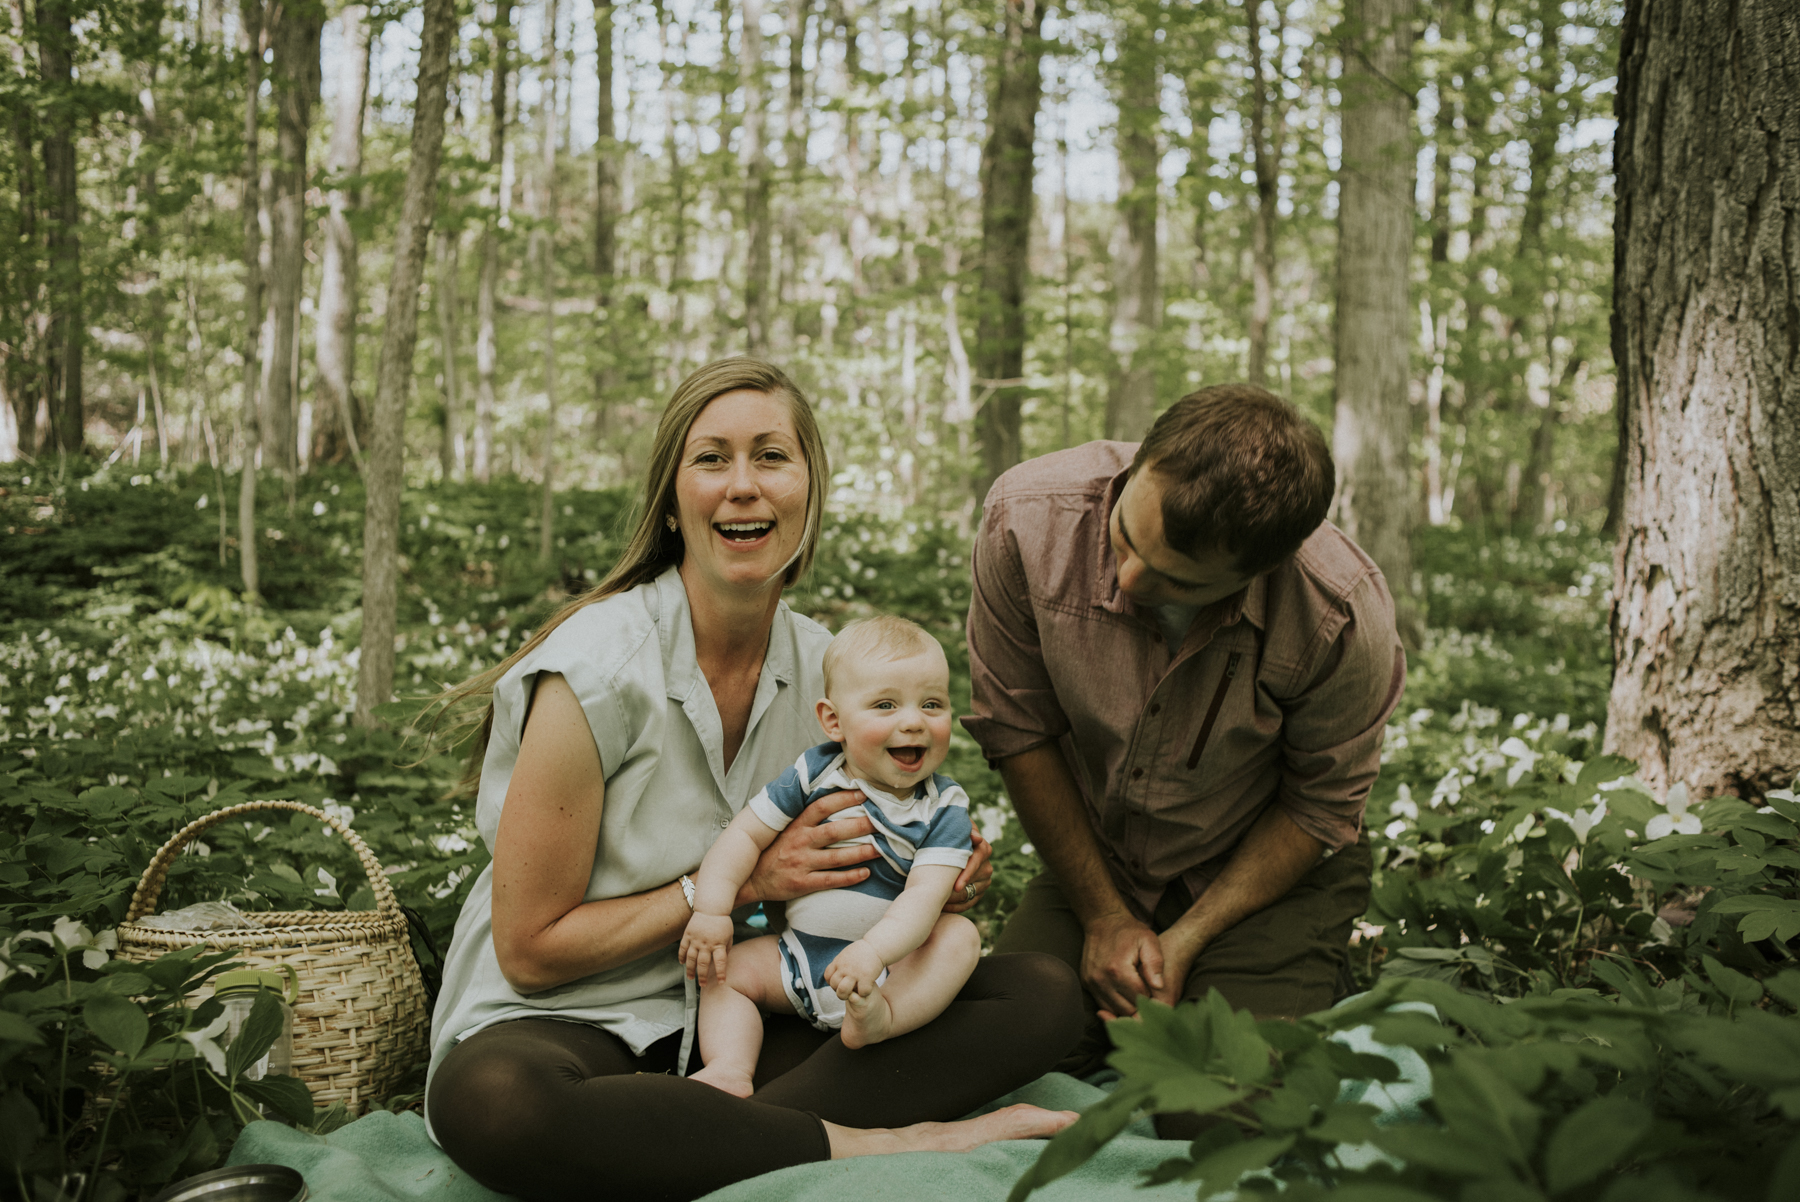 Family of three in Thornbury forest, Ontario.